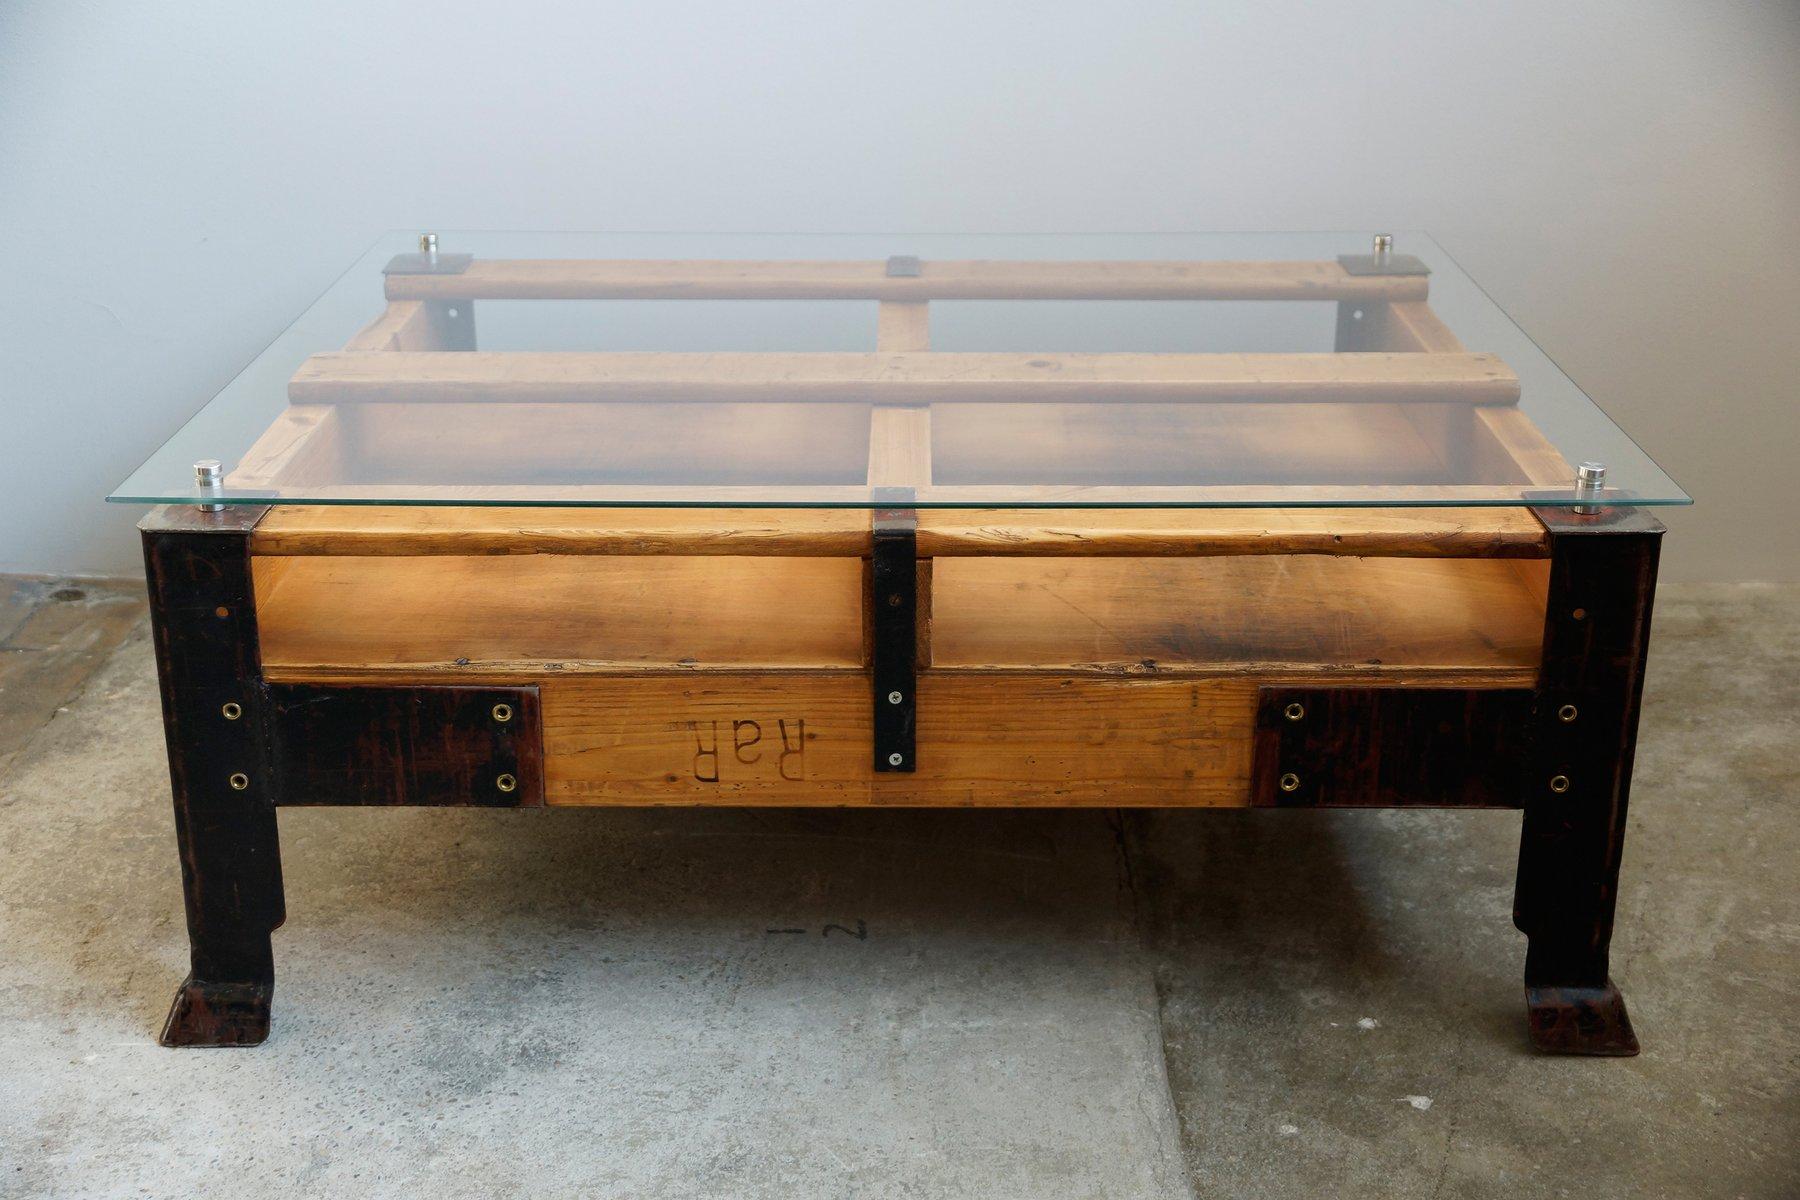 Table Basse Palette Industrielle - Table Basse Palette Industrielle Avec Dessus En Verre En Vente Sur [mjhdah]https://www.madecovintage.com/390-tm_thickbox_default/table-basse-palette-europe-naturelle.jpg